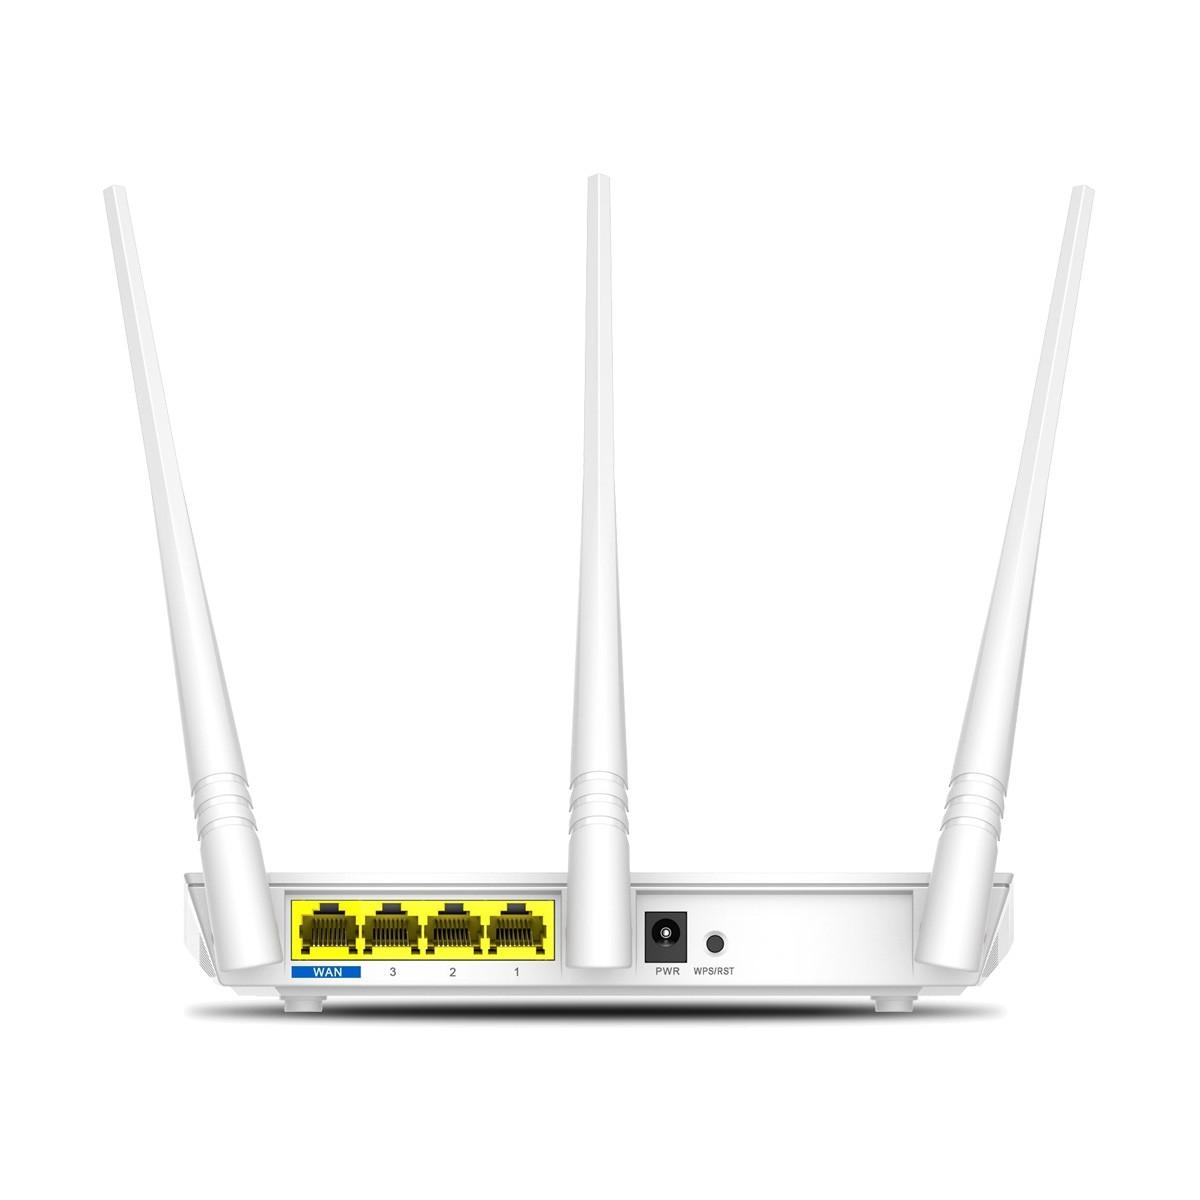 Tenda F3 300mbps Wireless N Router 3xantenna